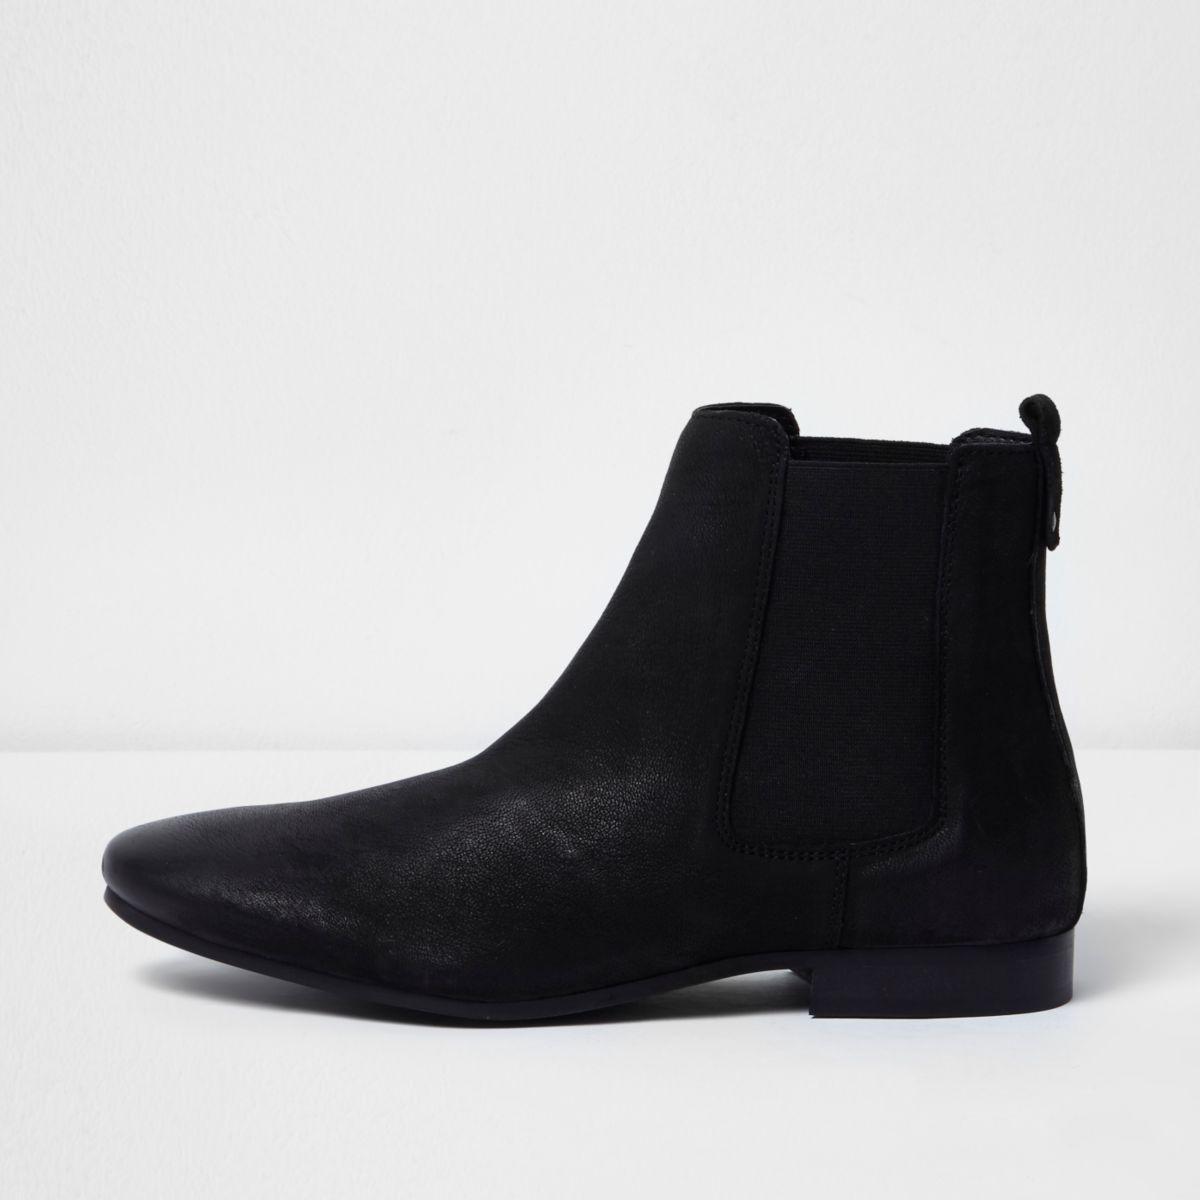 River Island Shoe Boots